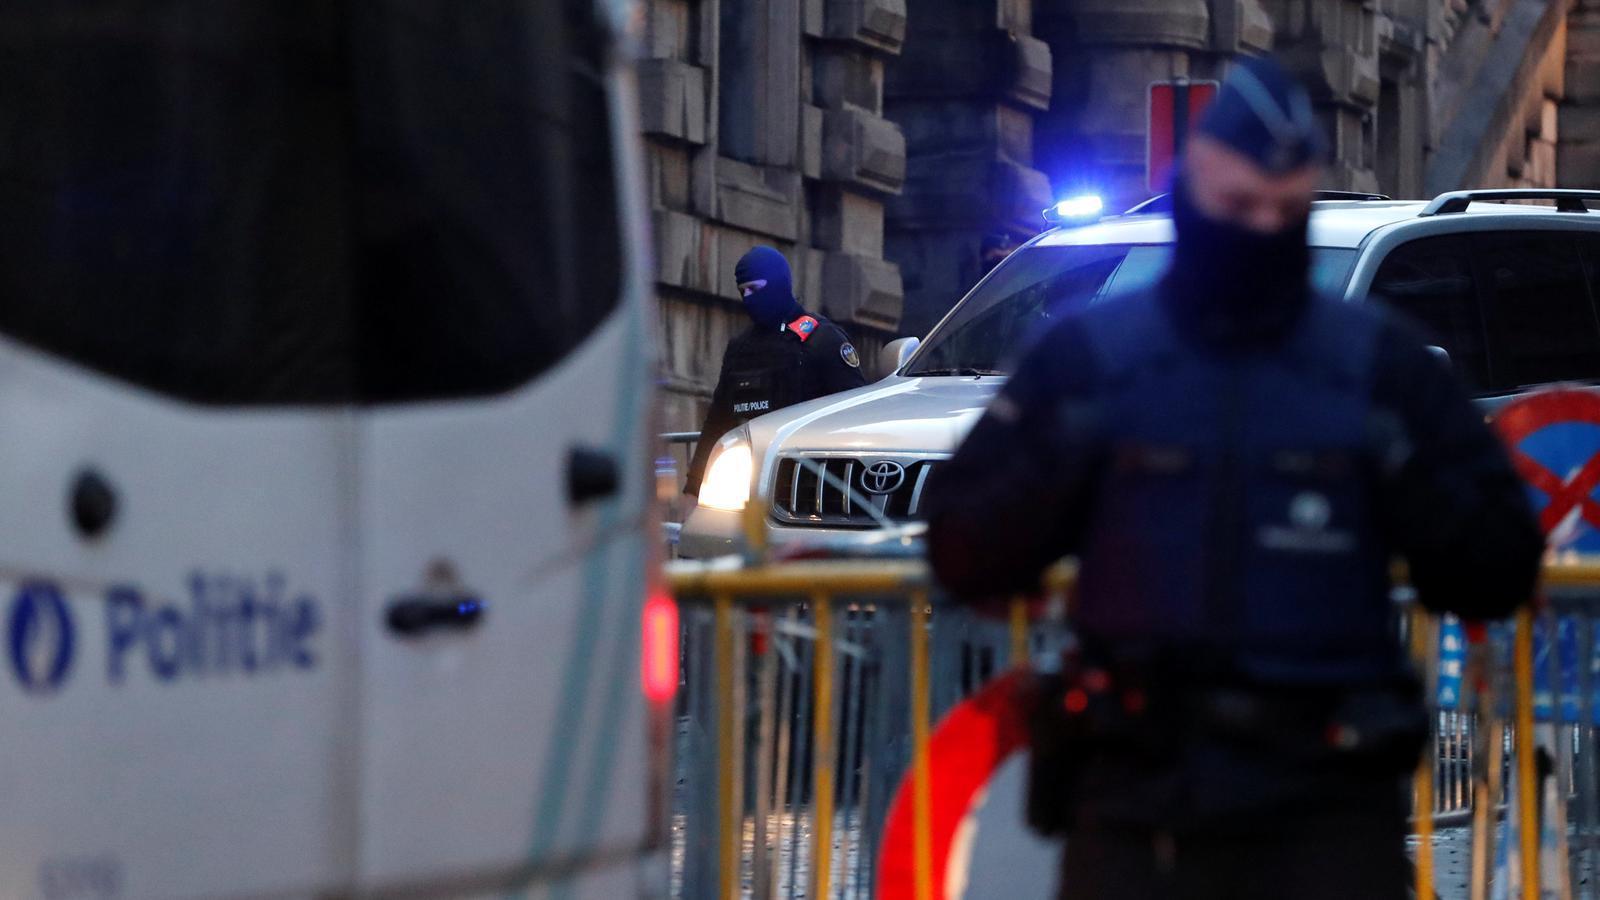 El comboi policial que trasllada Salah Abdeslam al Palau de Justícia de Brussel·les. / YVES HERMAN / REUTERS